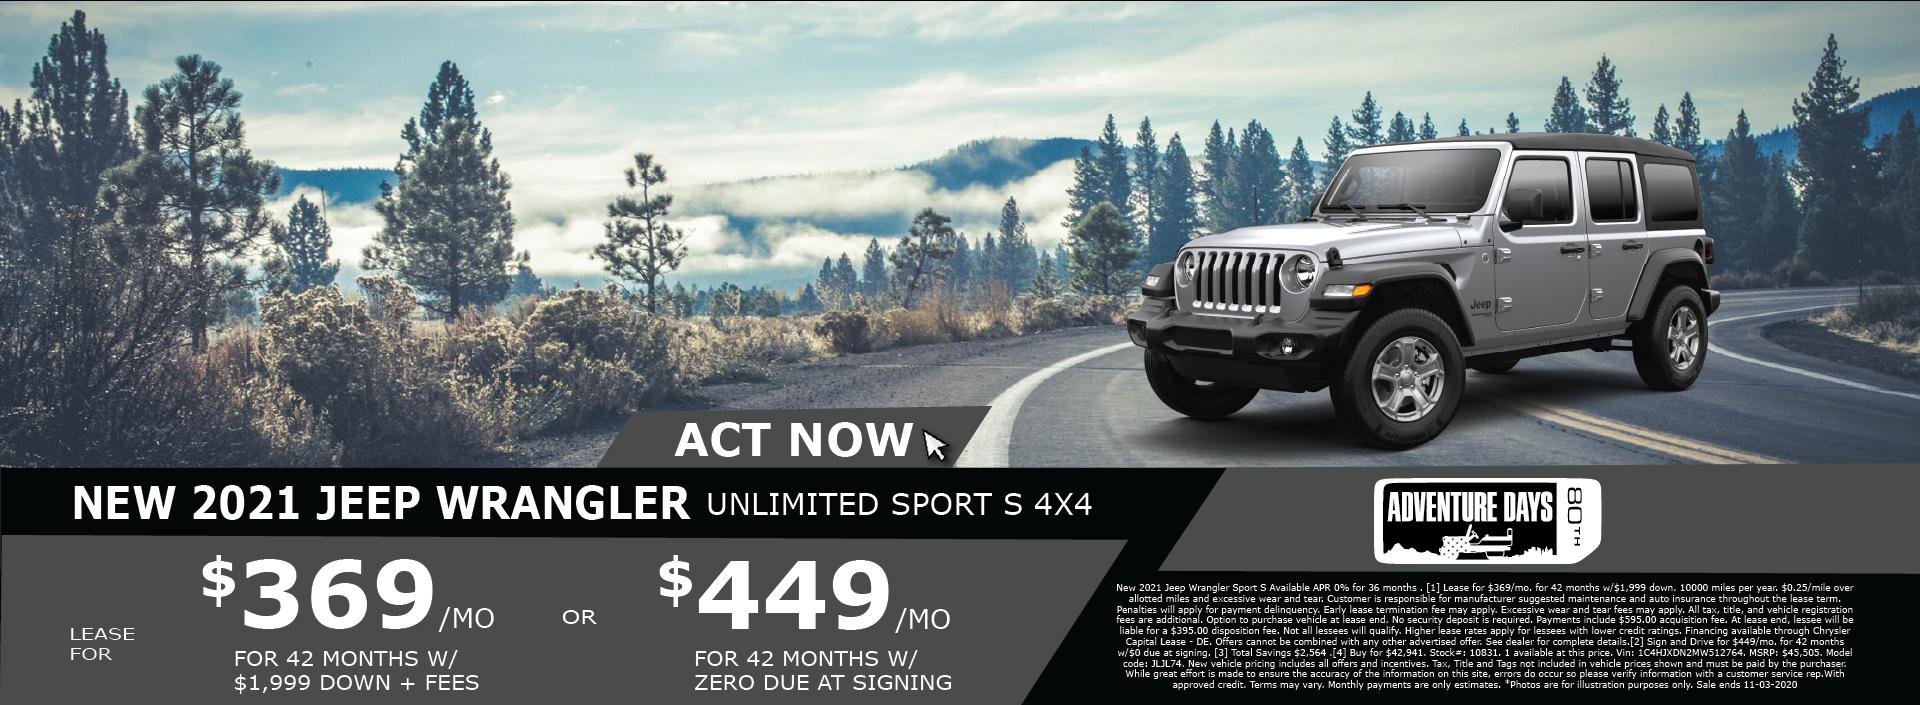 Whitewater – Jeep Wrangler October